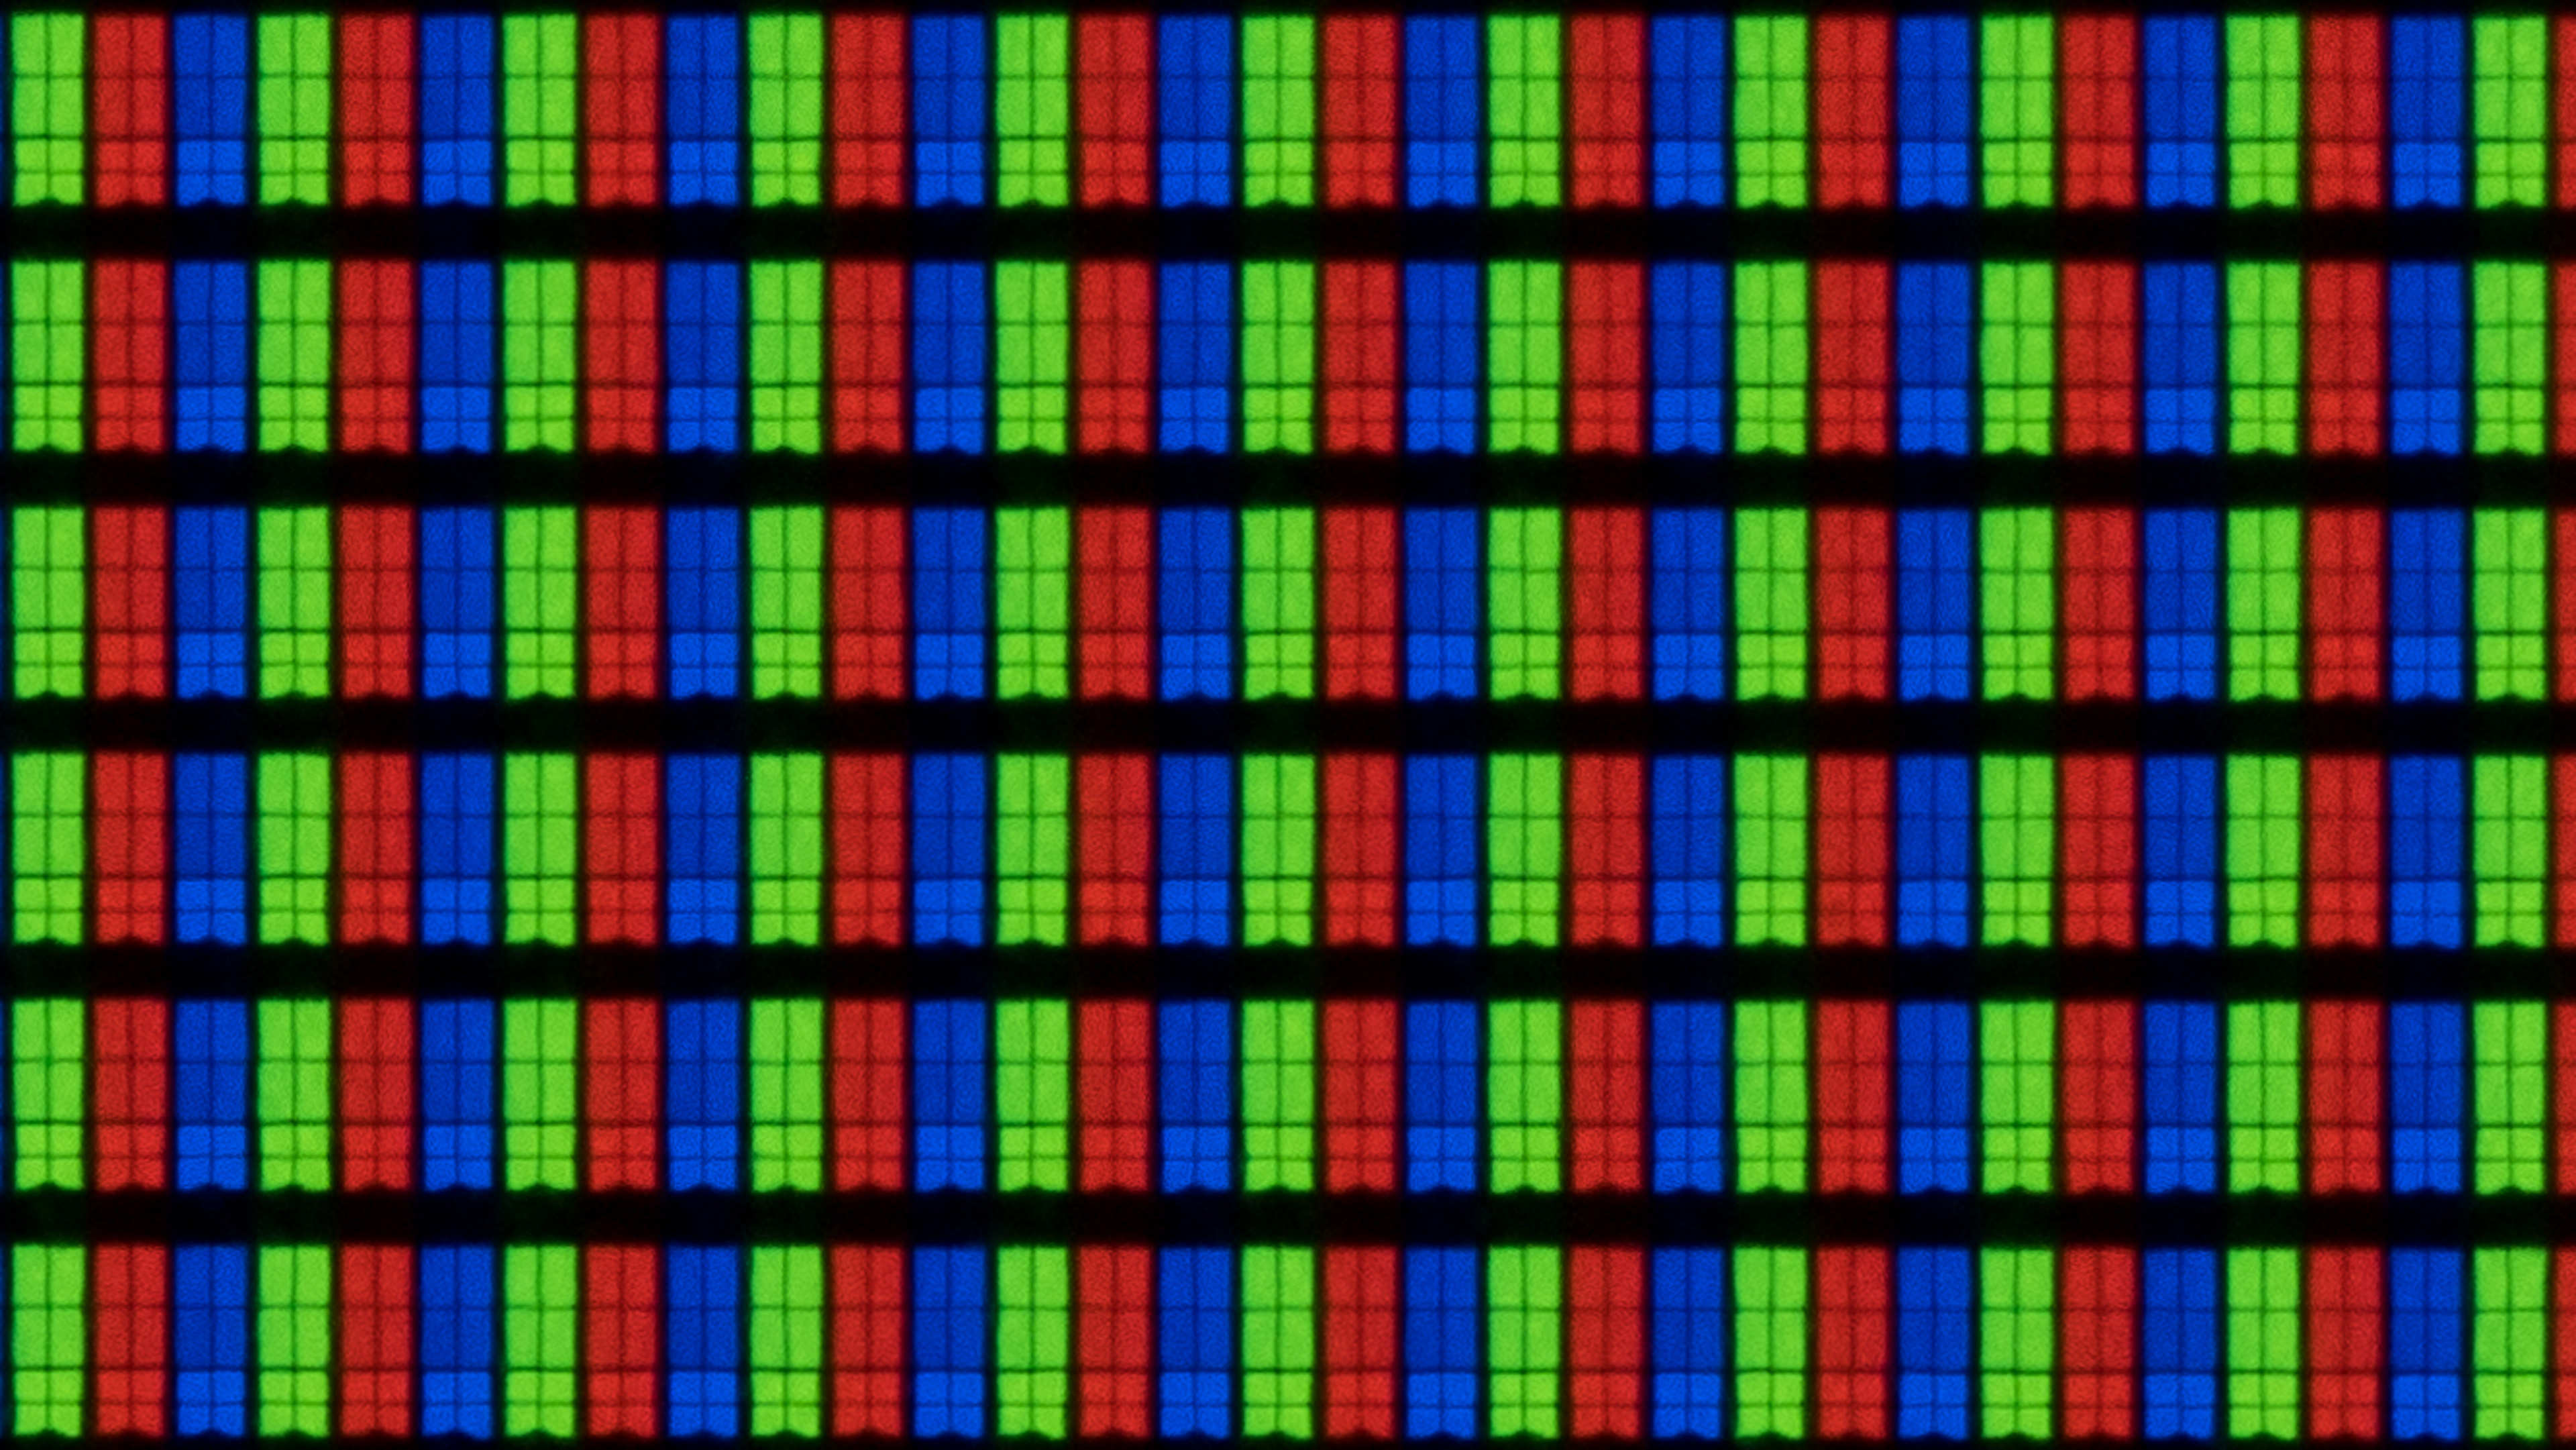 pixels-large.jpg